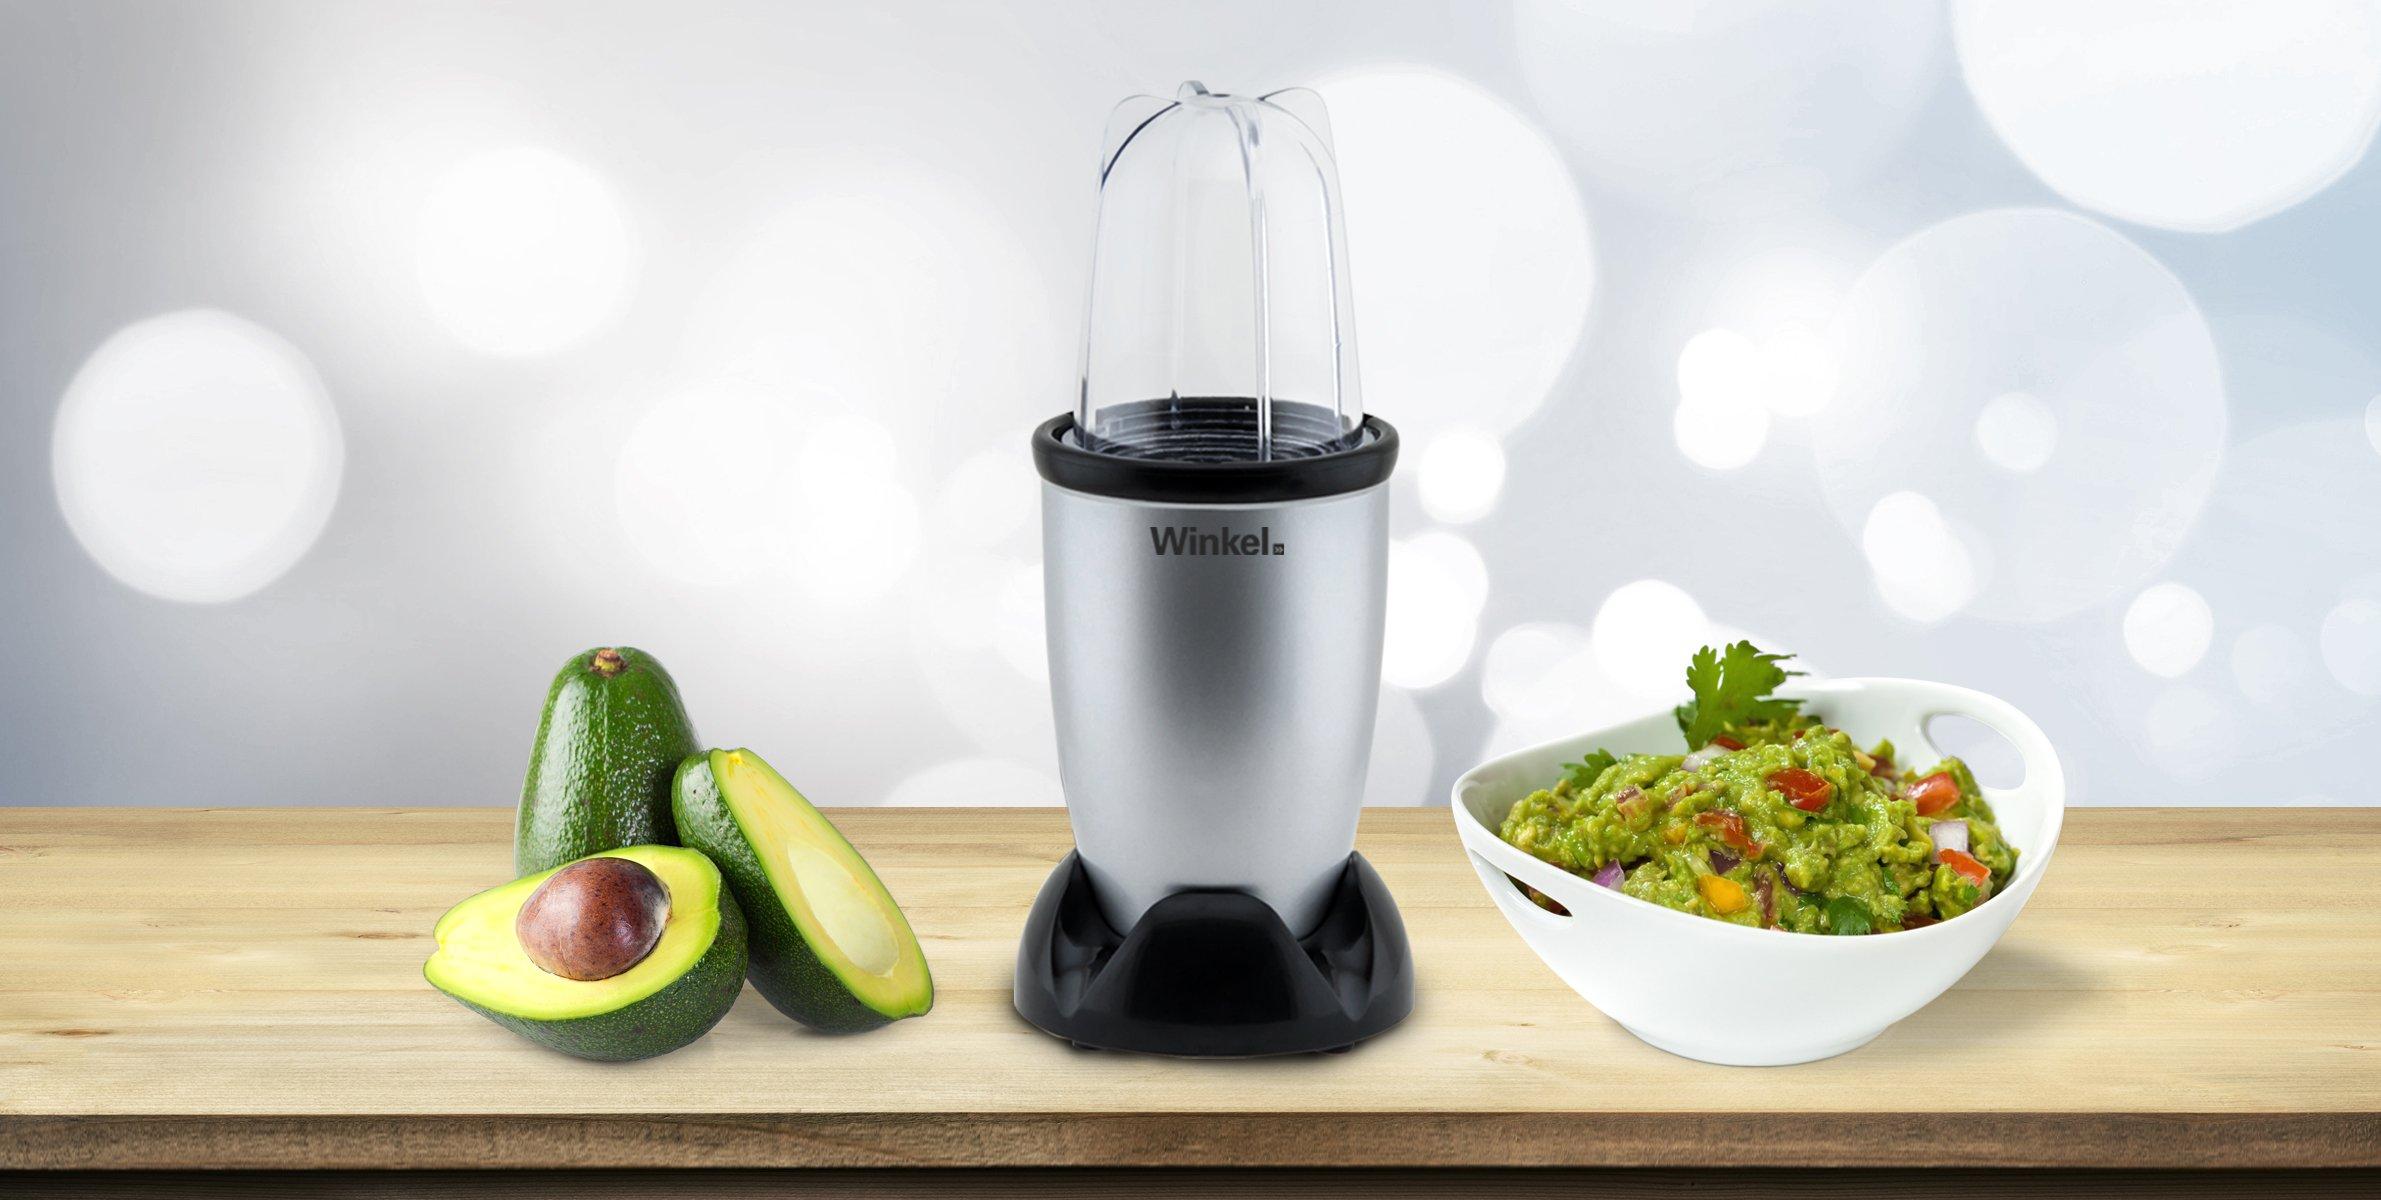 Winkel-KBL20-Kitchen-Bullet-Kchenmaschine-8-Funktionen-Edelstahlklingen